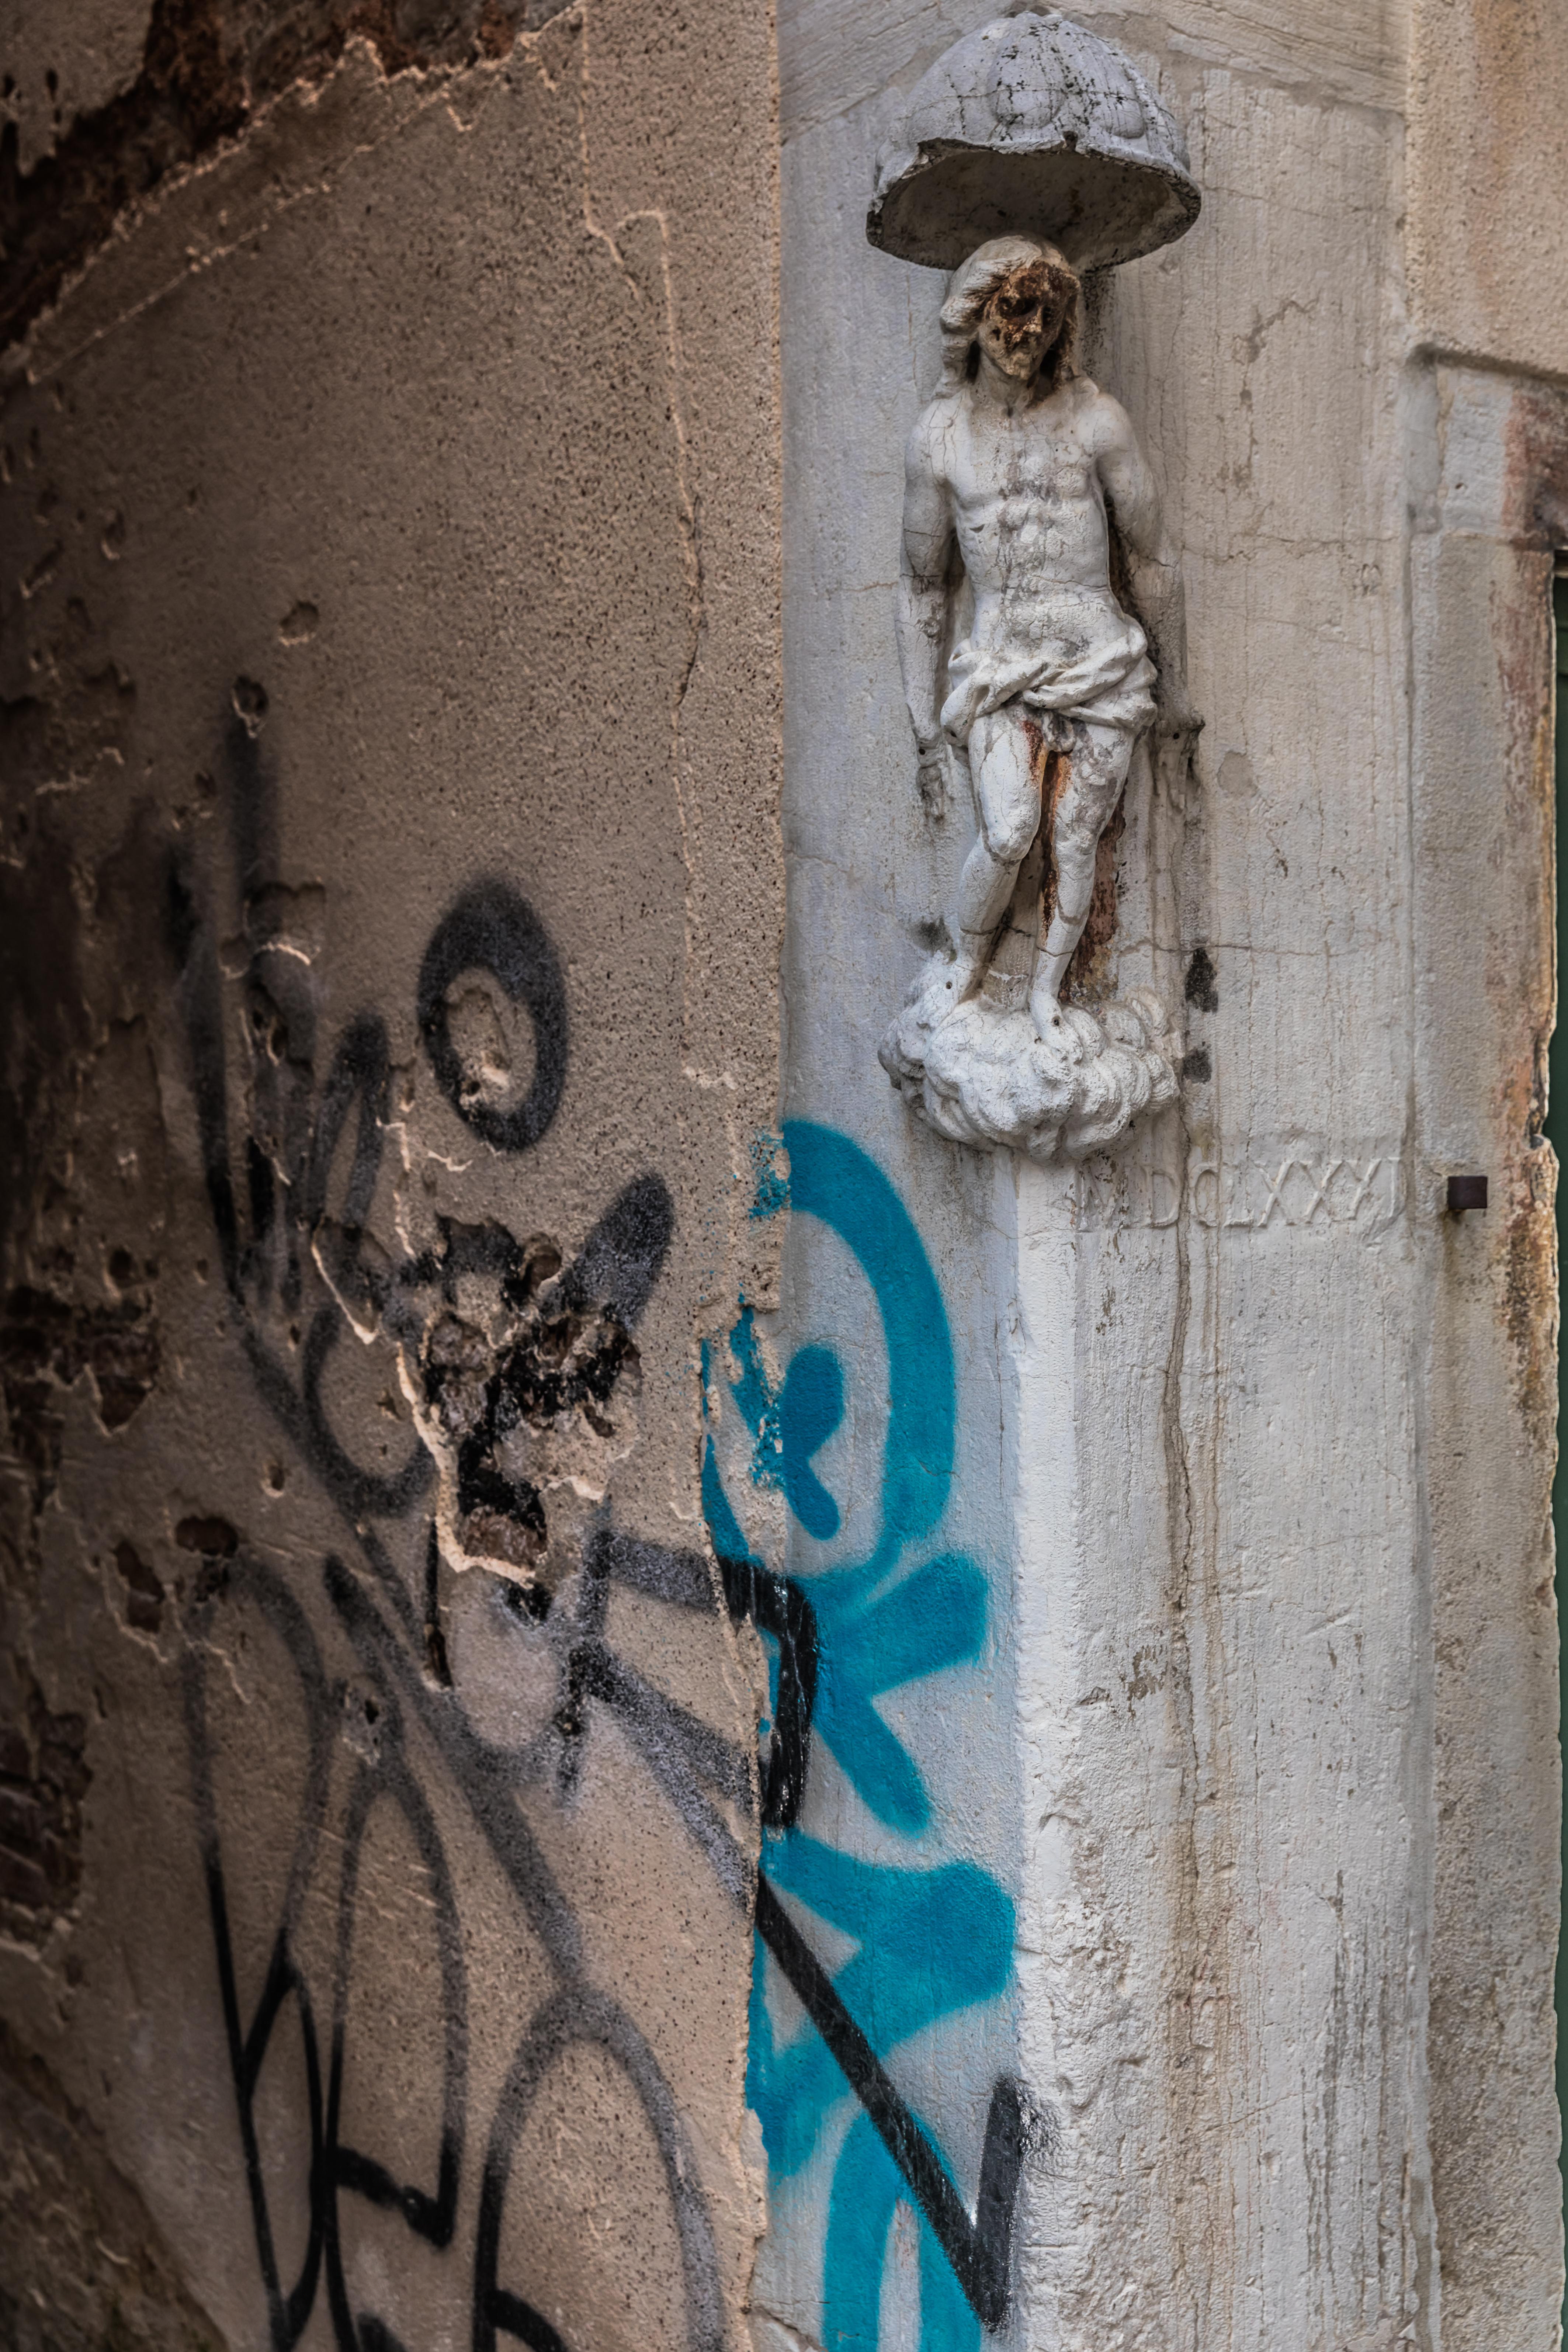 venice-details-street-sculpture-santa-croce